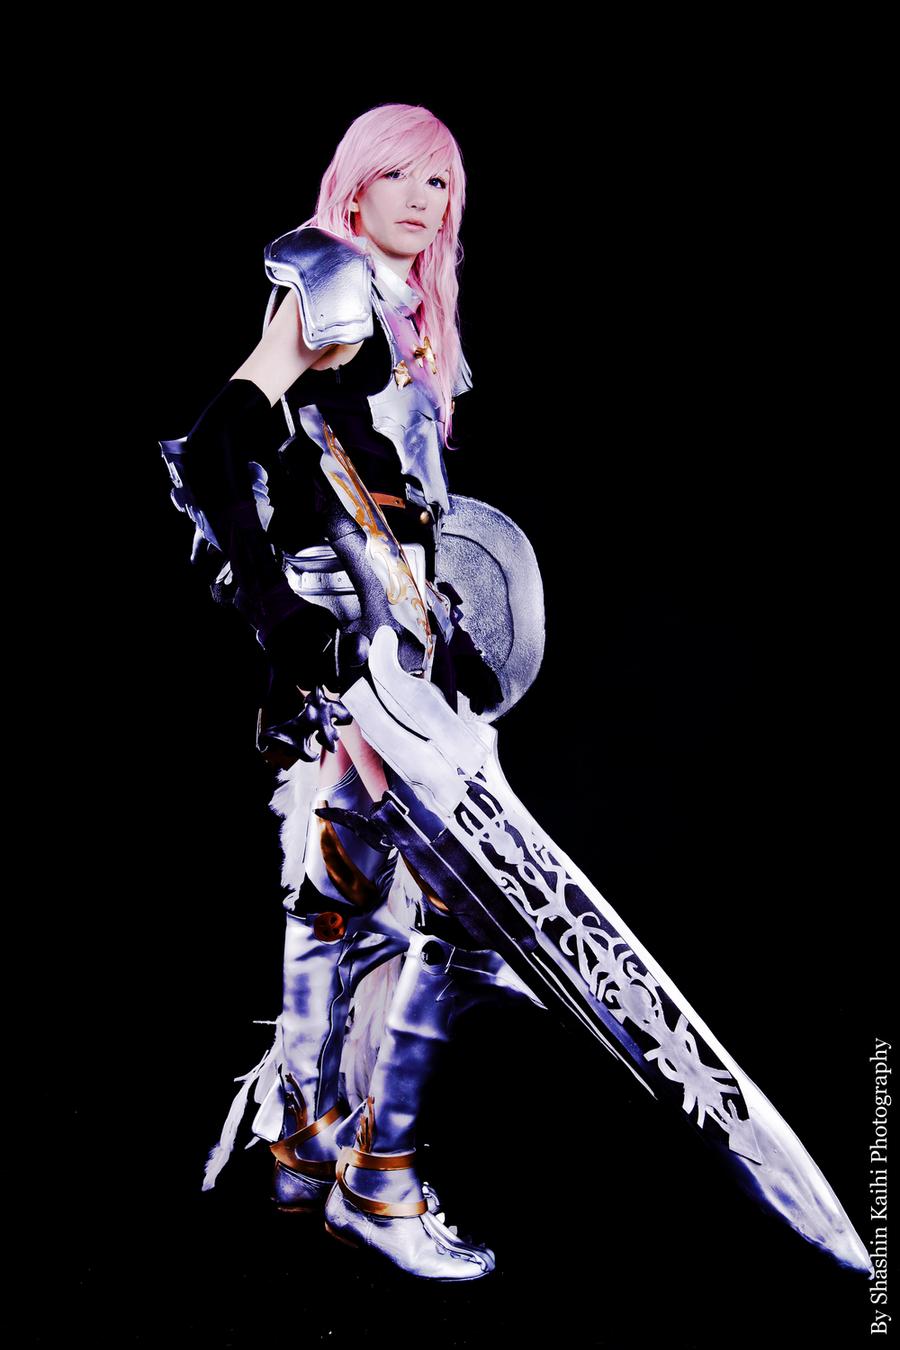 Warrior Goddess by cyberlight